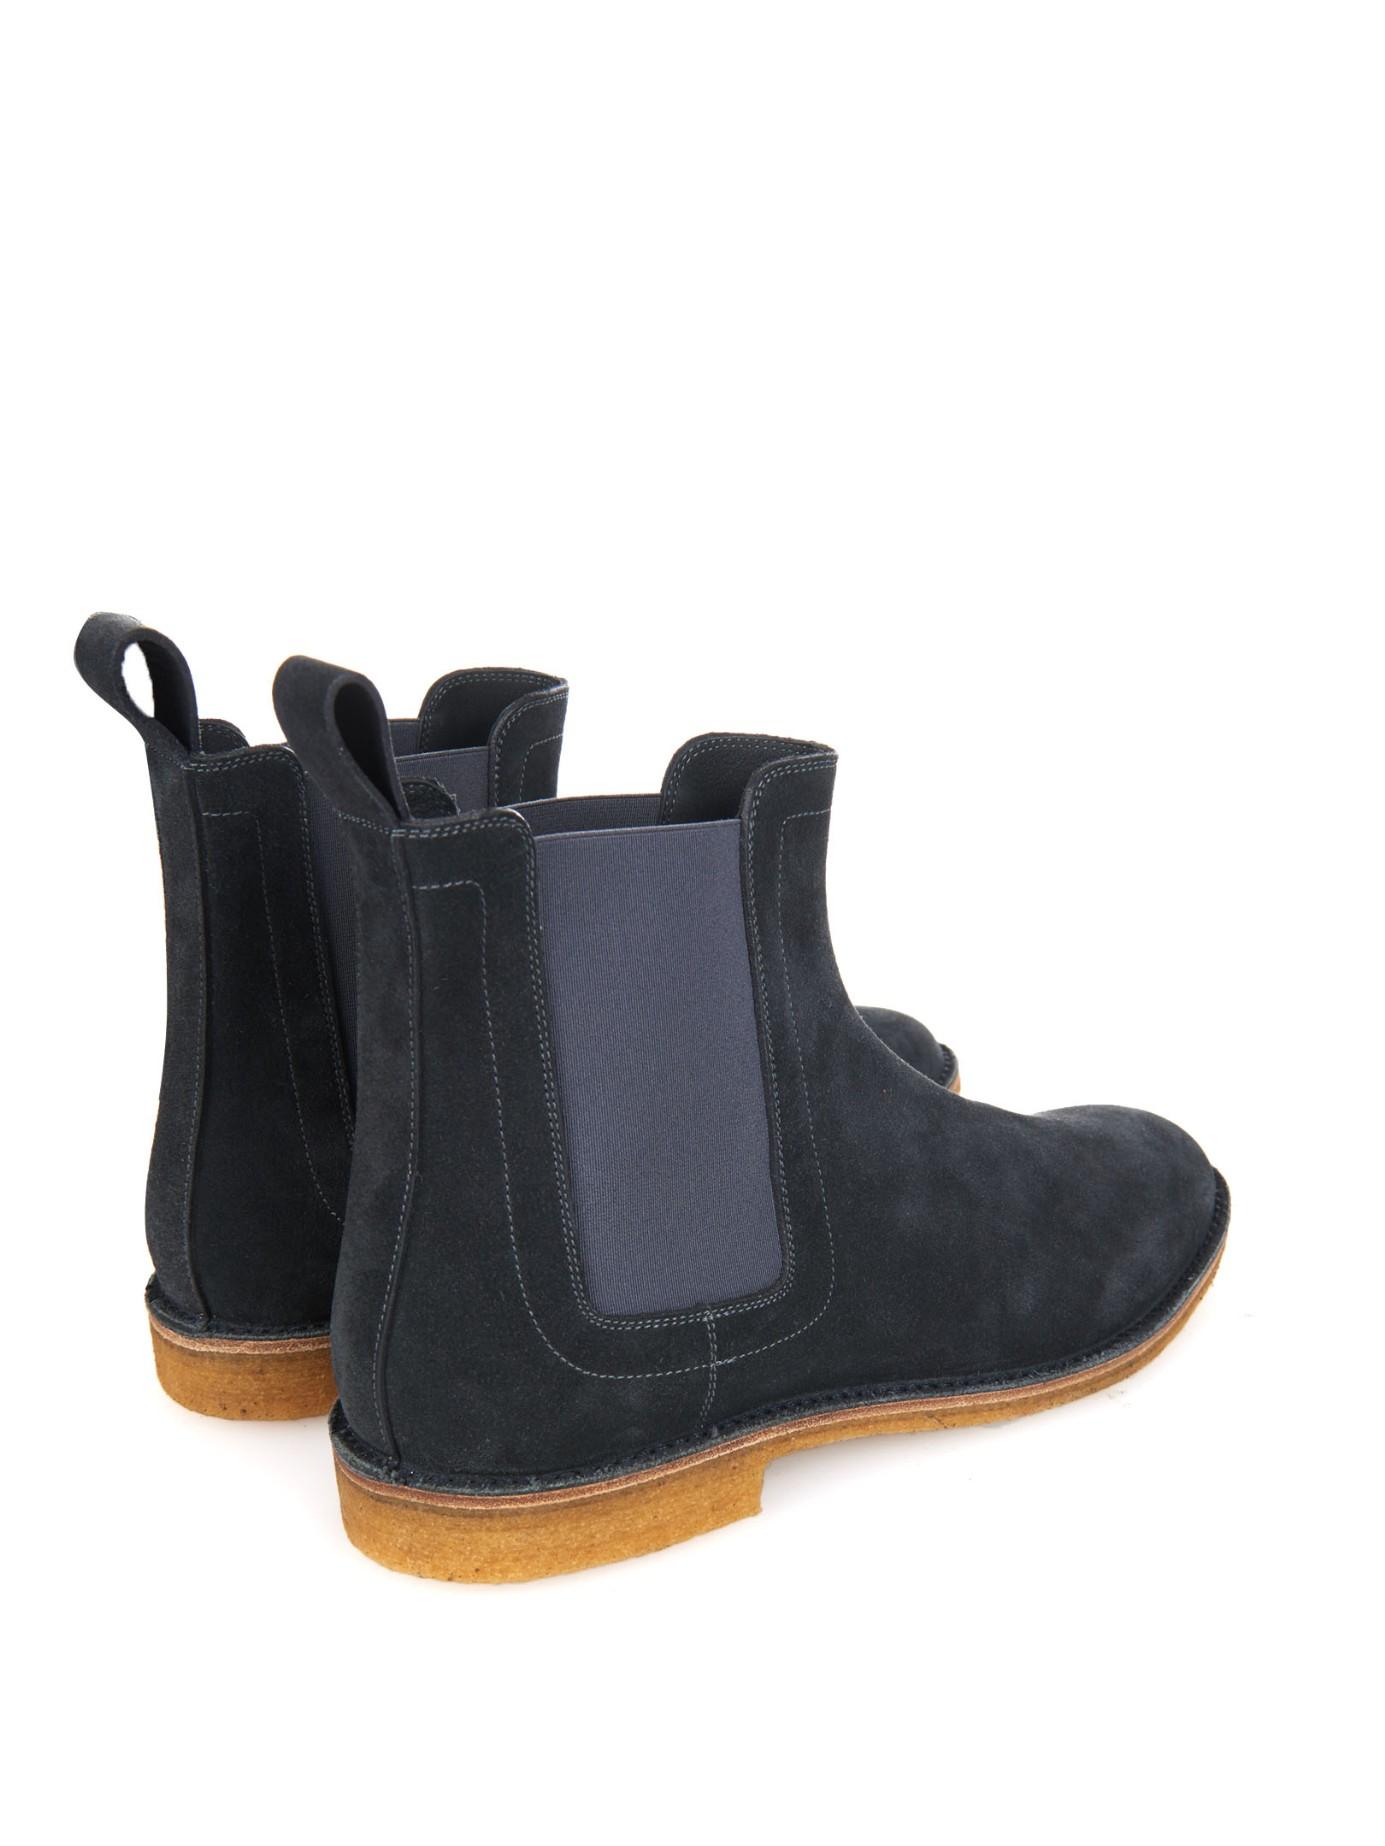 Elegant Bottega Veneta Suede Chelsea Boots In Gray For Men  Lyst